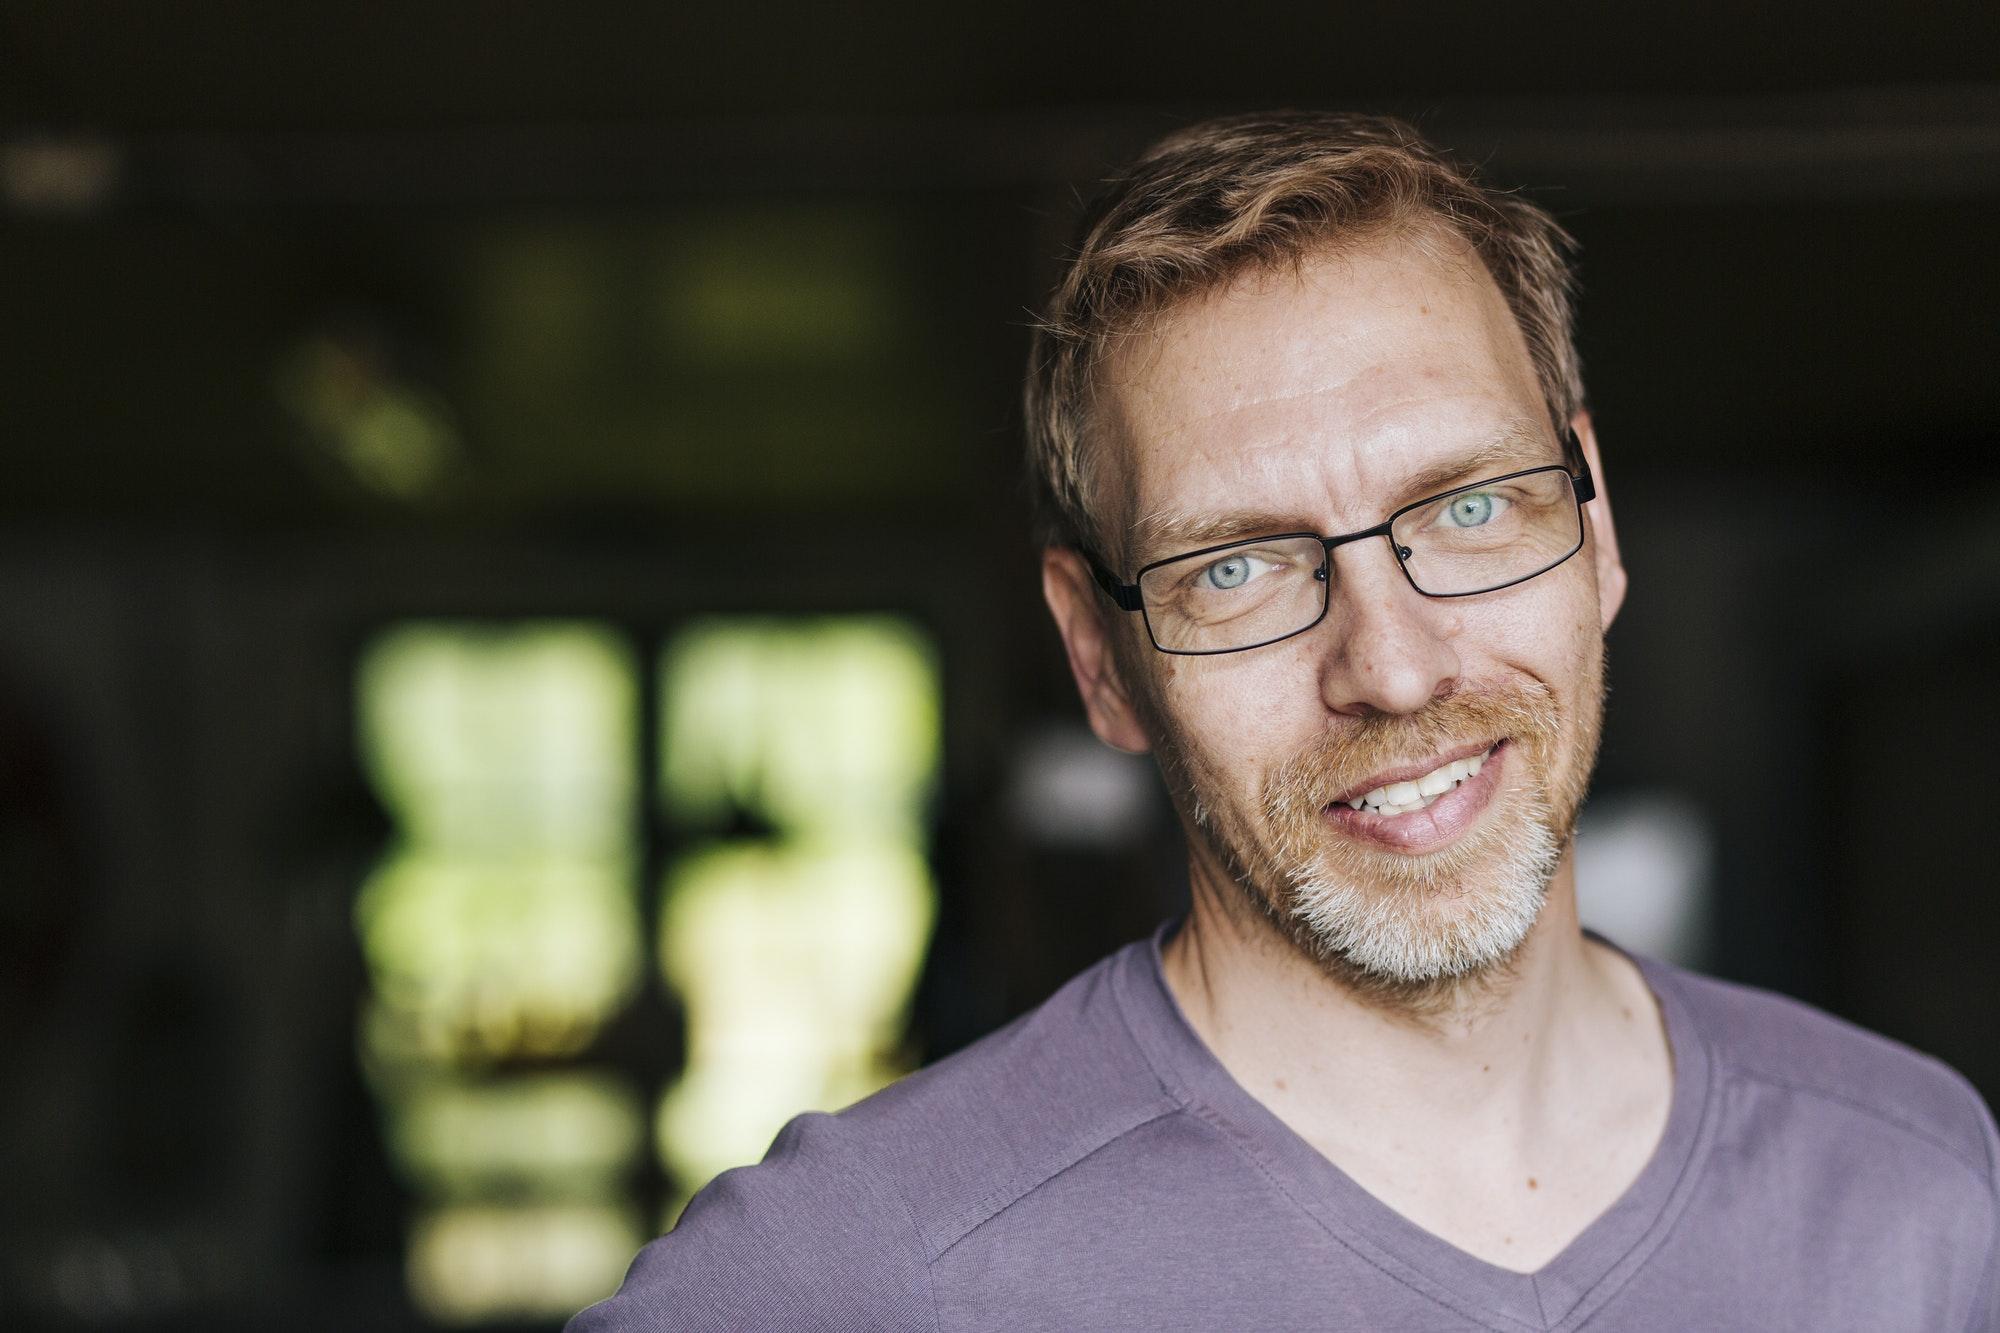 Portrait of smiling man wearing eyeglasses